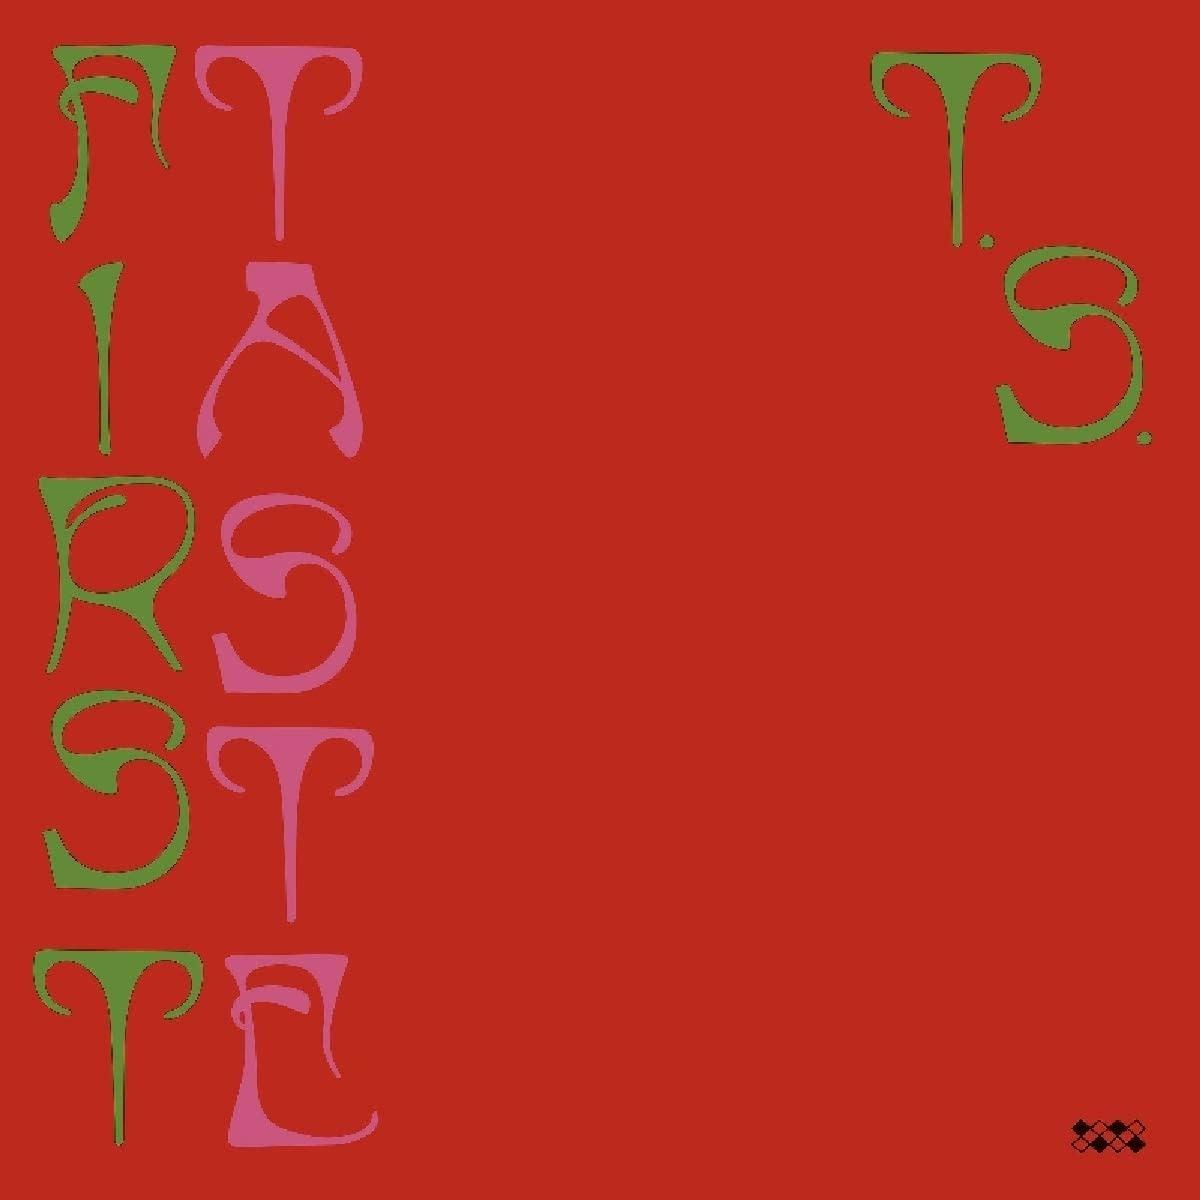 Ty Segall - First Taste